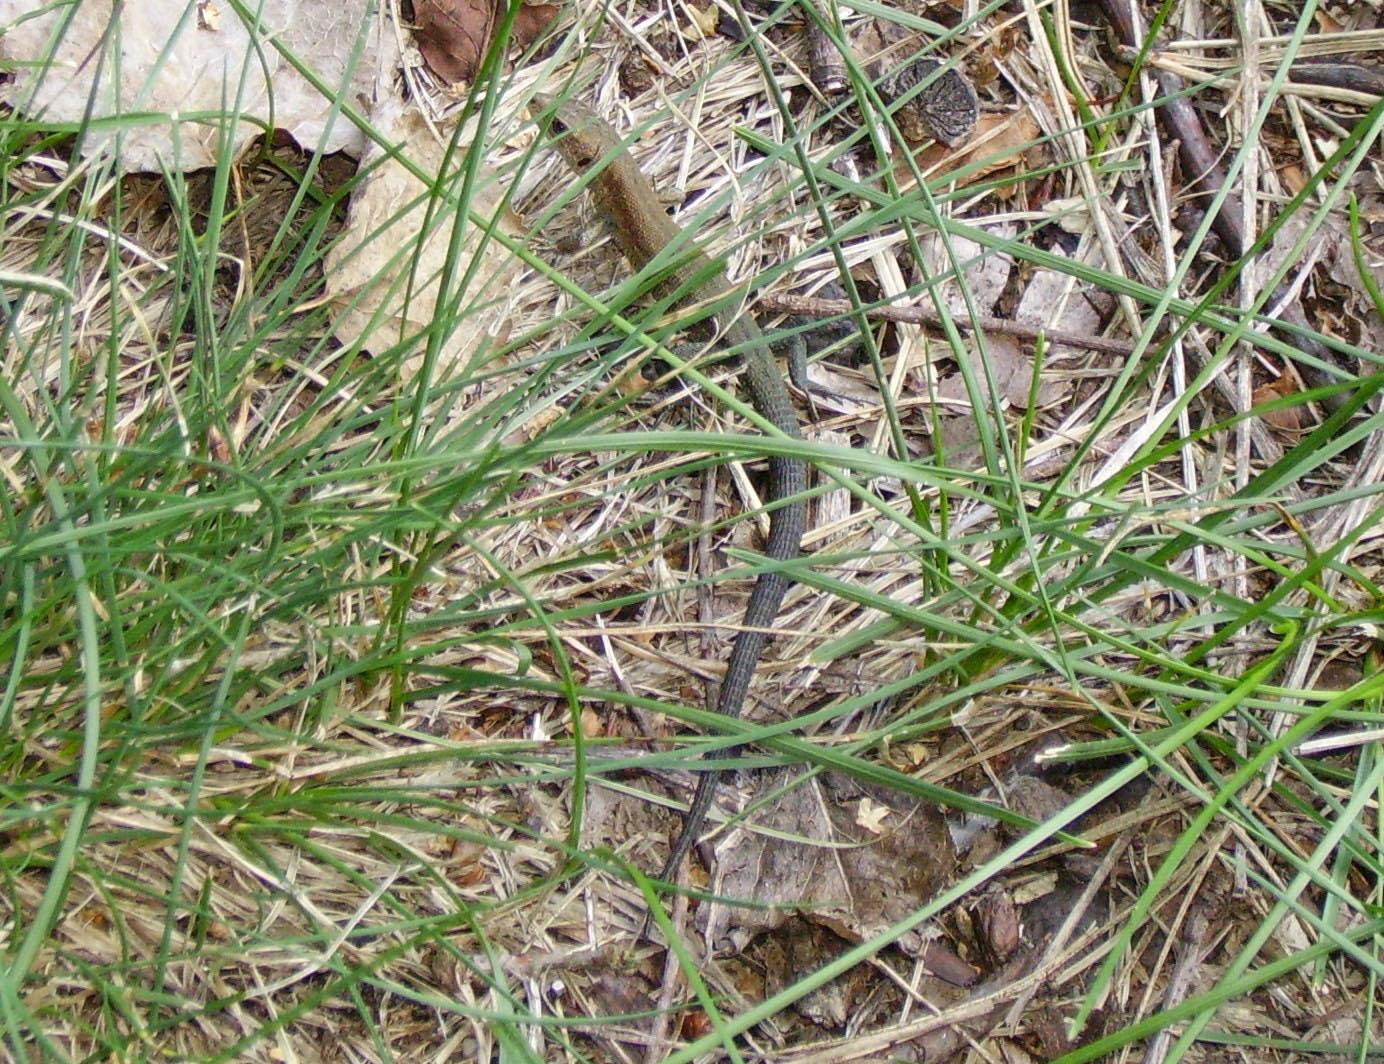 File:Lizard camouflage.jpg - Wikimedia Commons